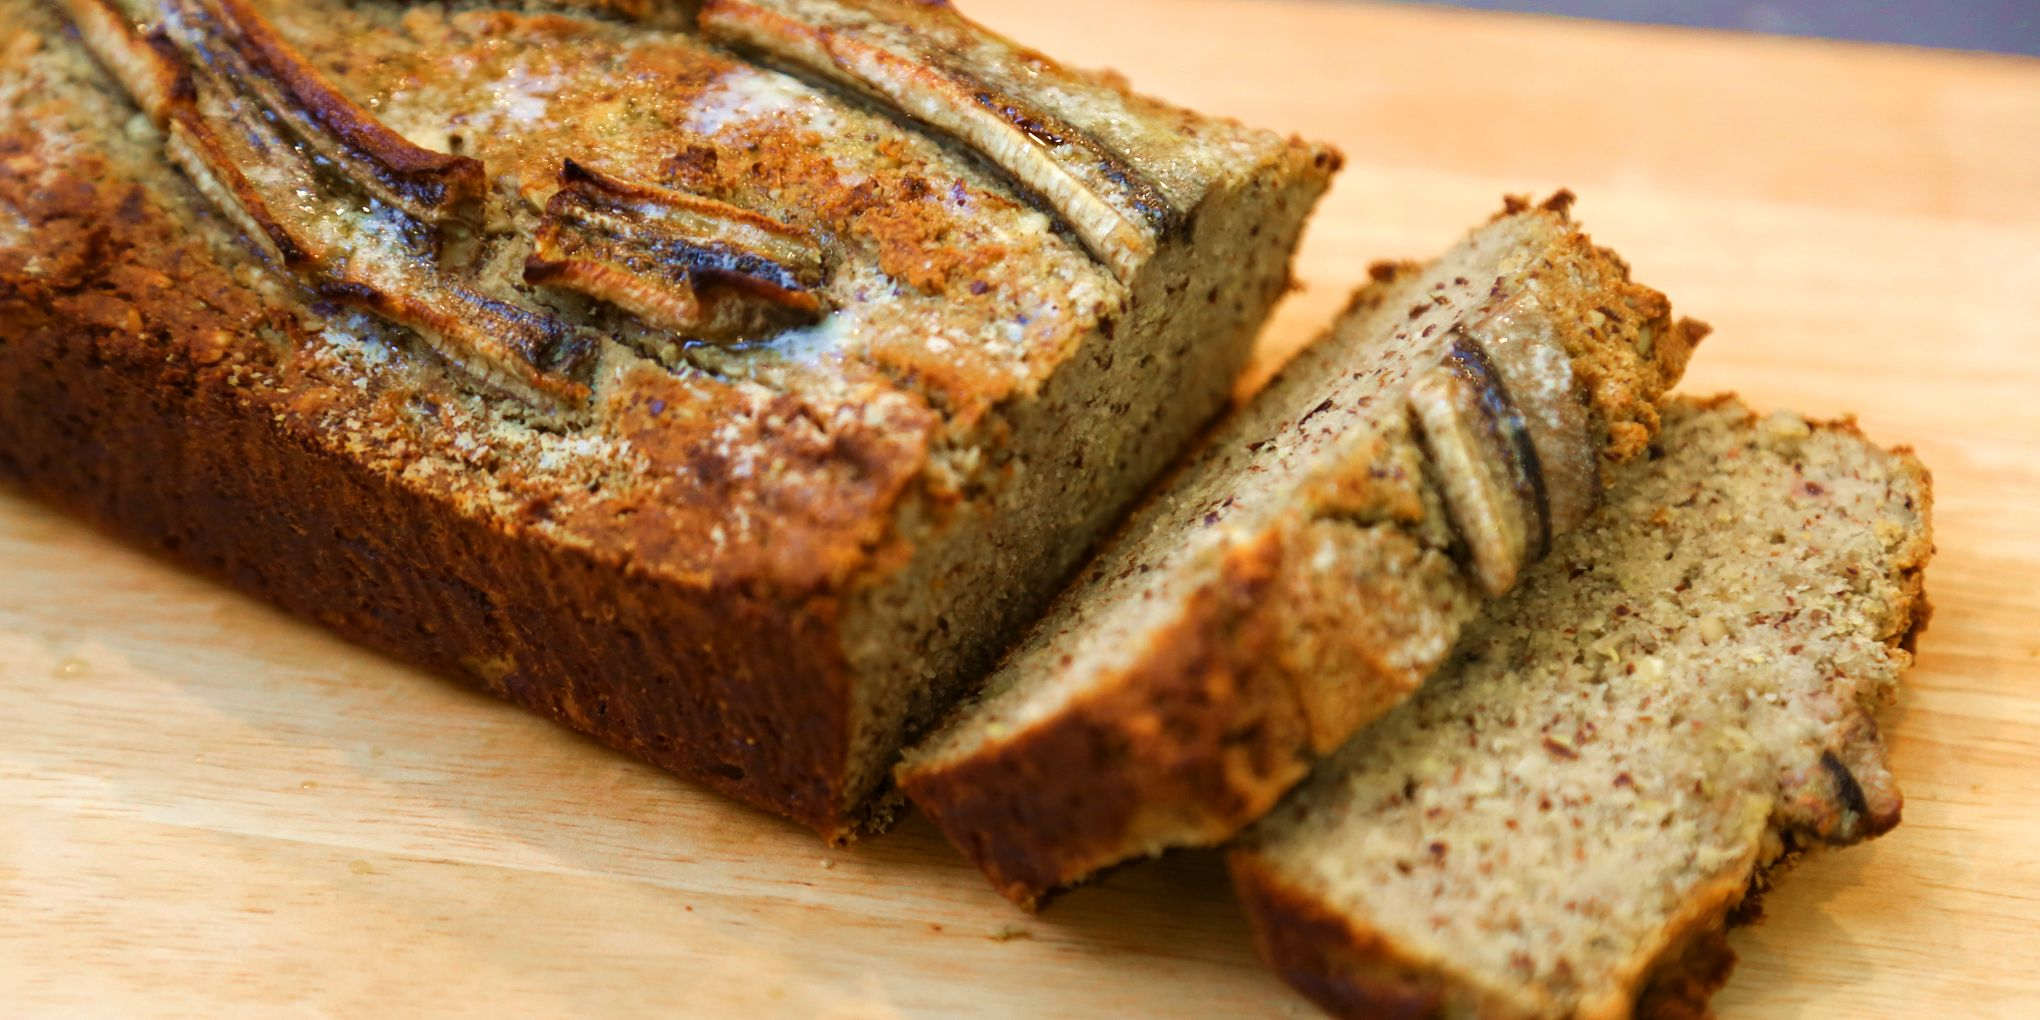 The easiest sugarfree, glutenfree banana bread you'll